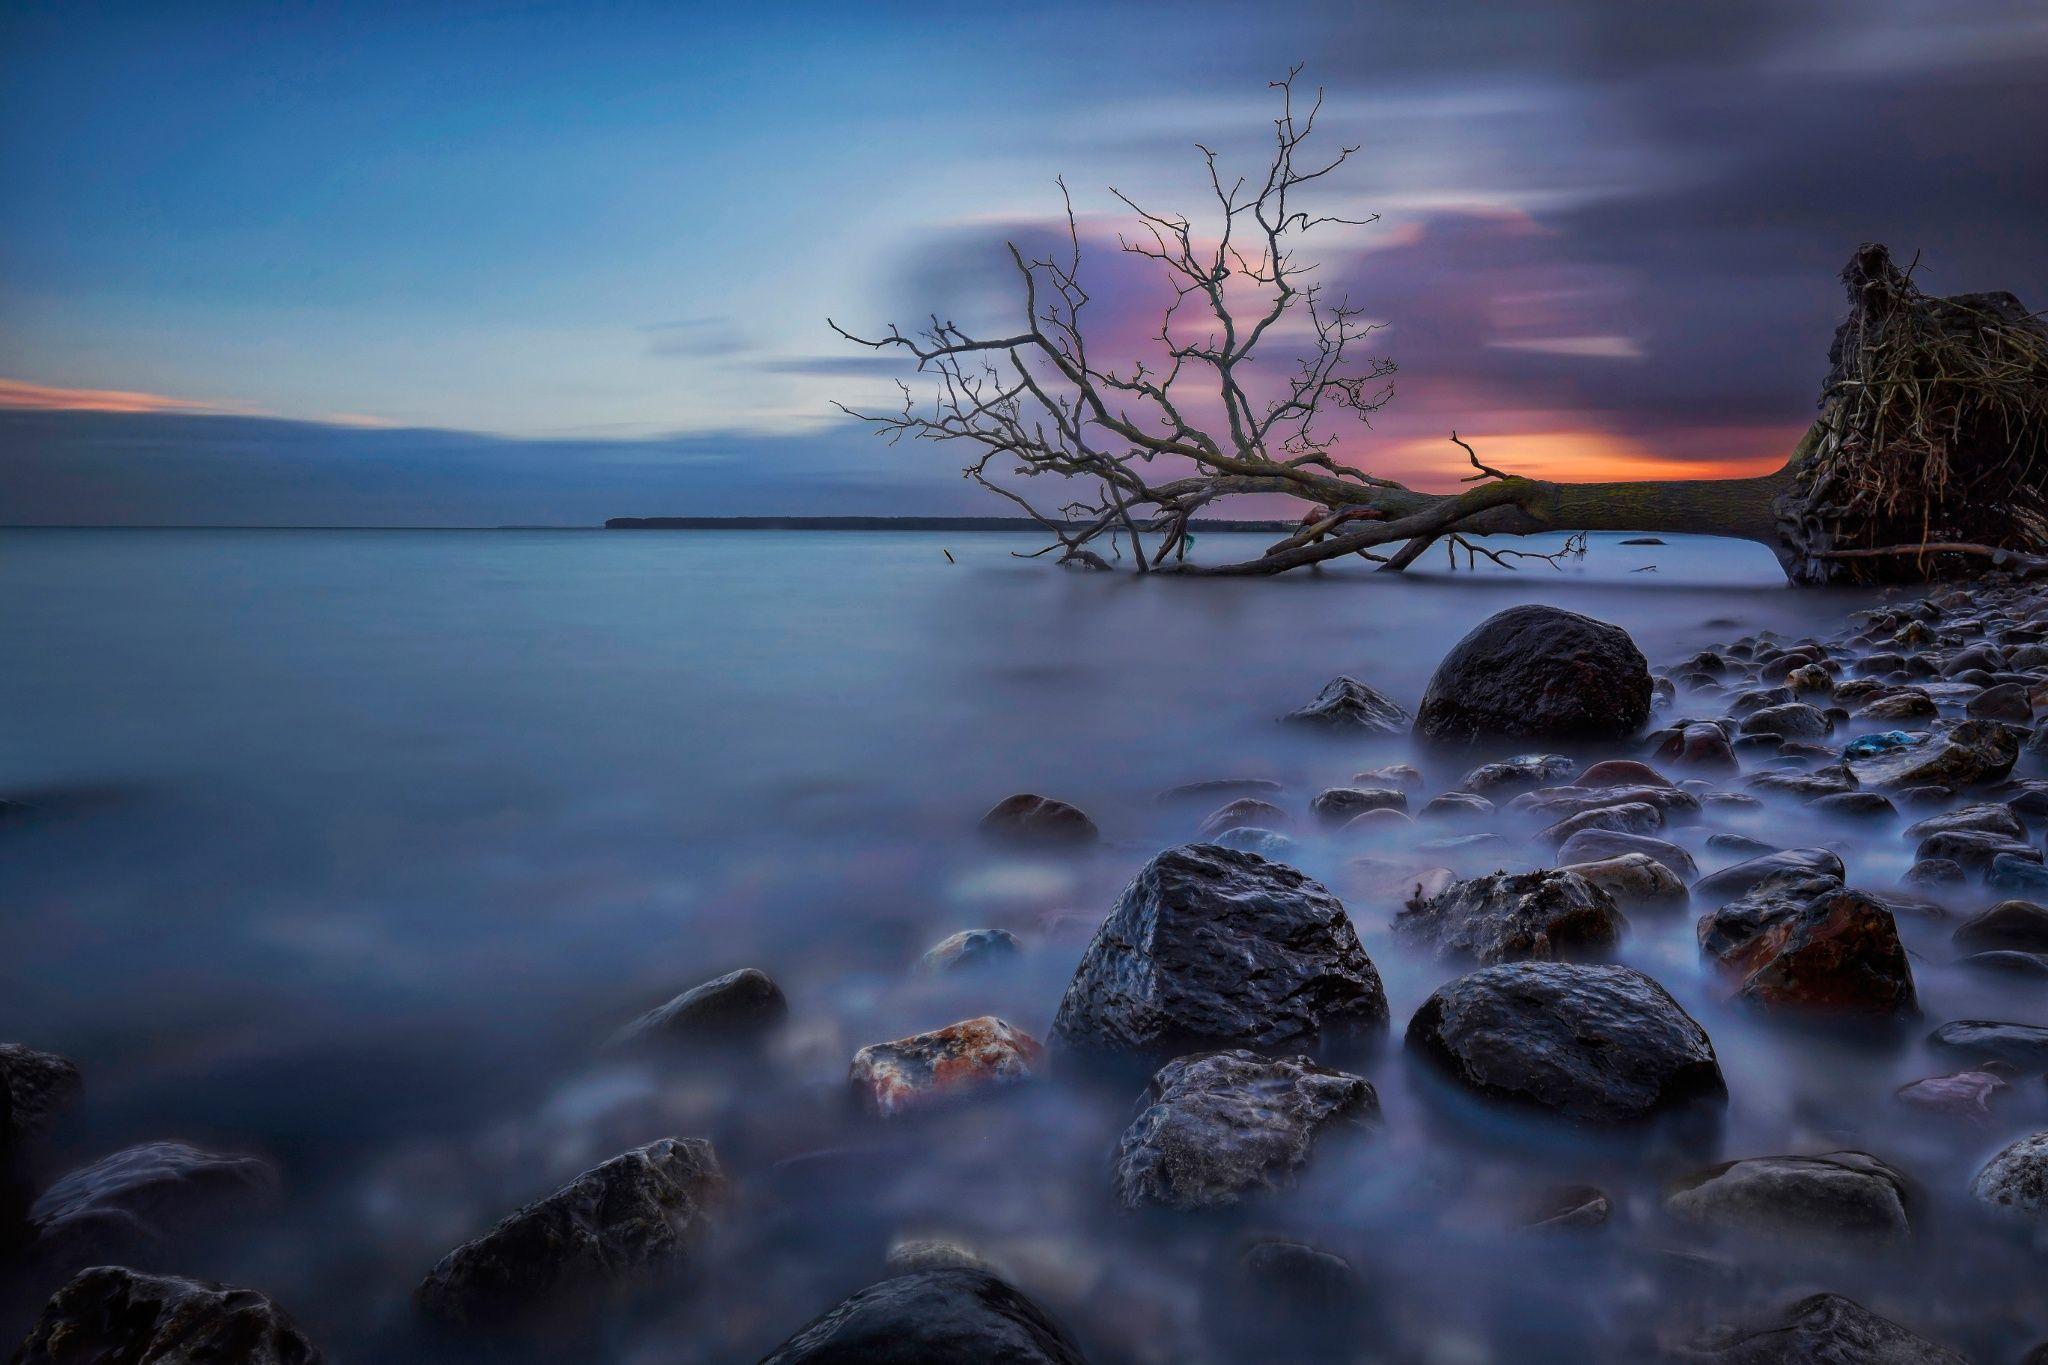 Фотография The Fallen Tree V автор Martin Worsøe Jensen на 500px